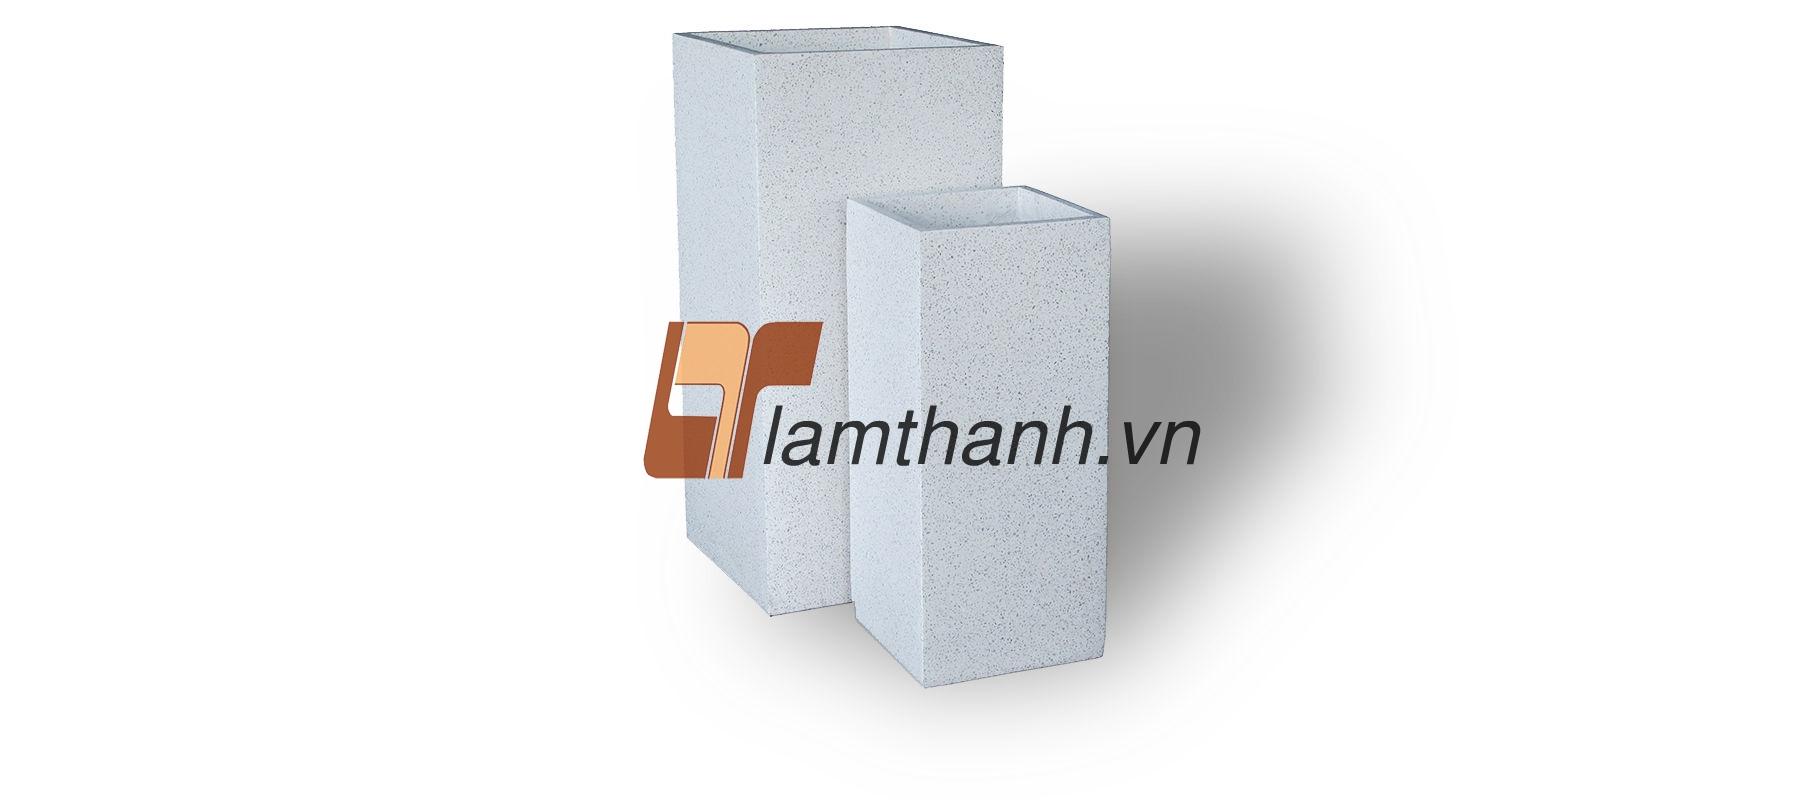 vietnam terrazzo, concrete 03